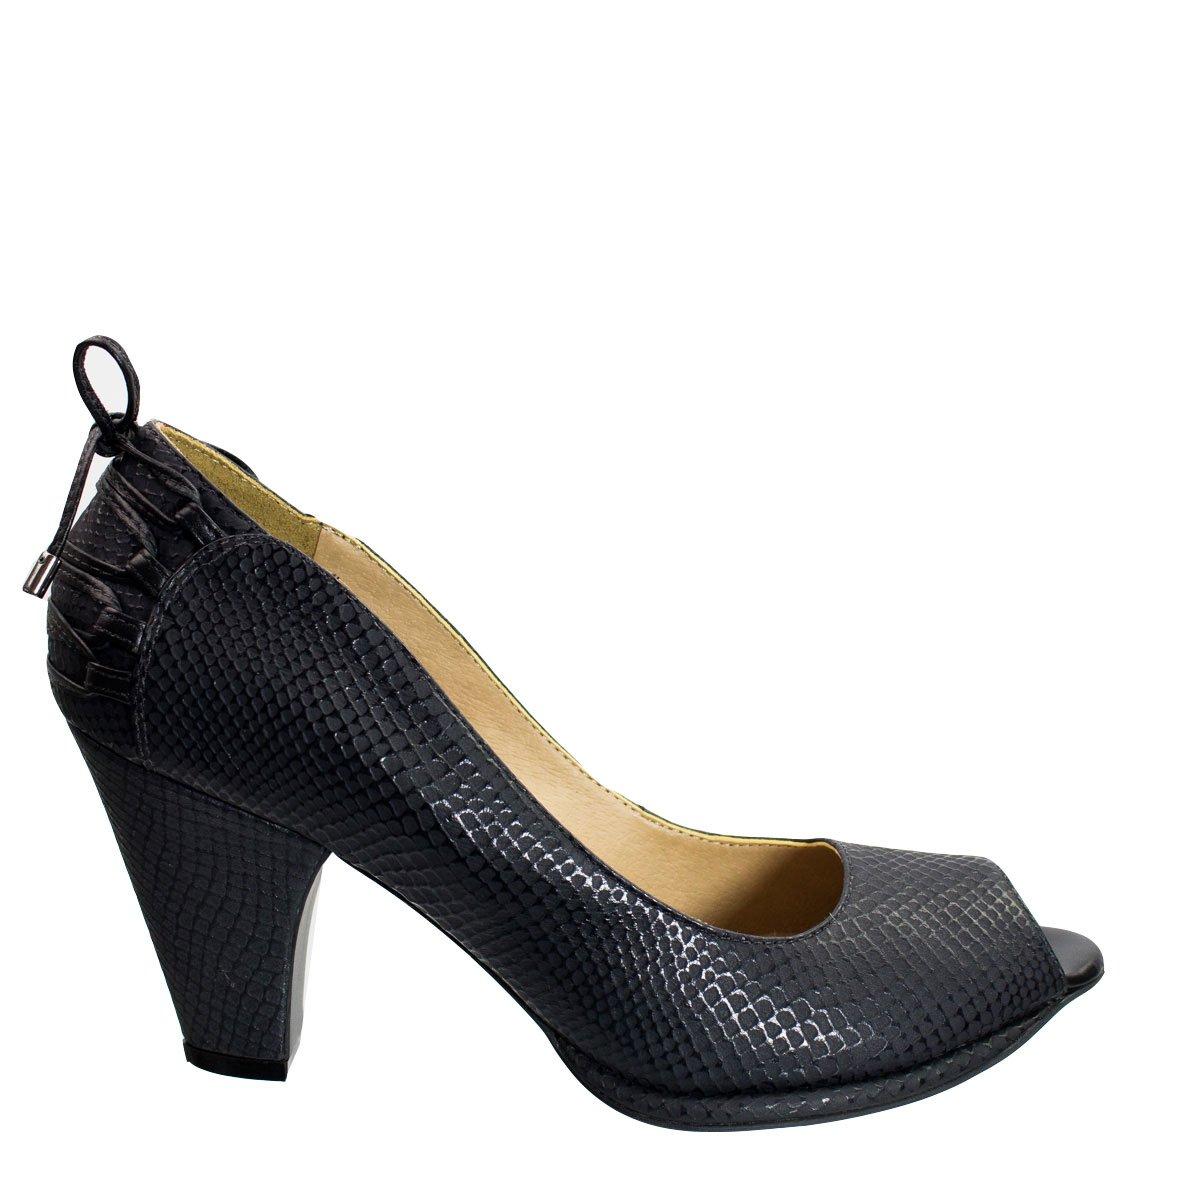 Bizz Store - Sapato Peep Toe Feminino Cristófoli Katty Couro f8686dc7fd8c1